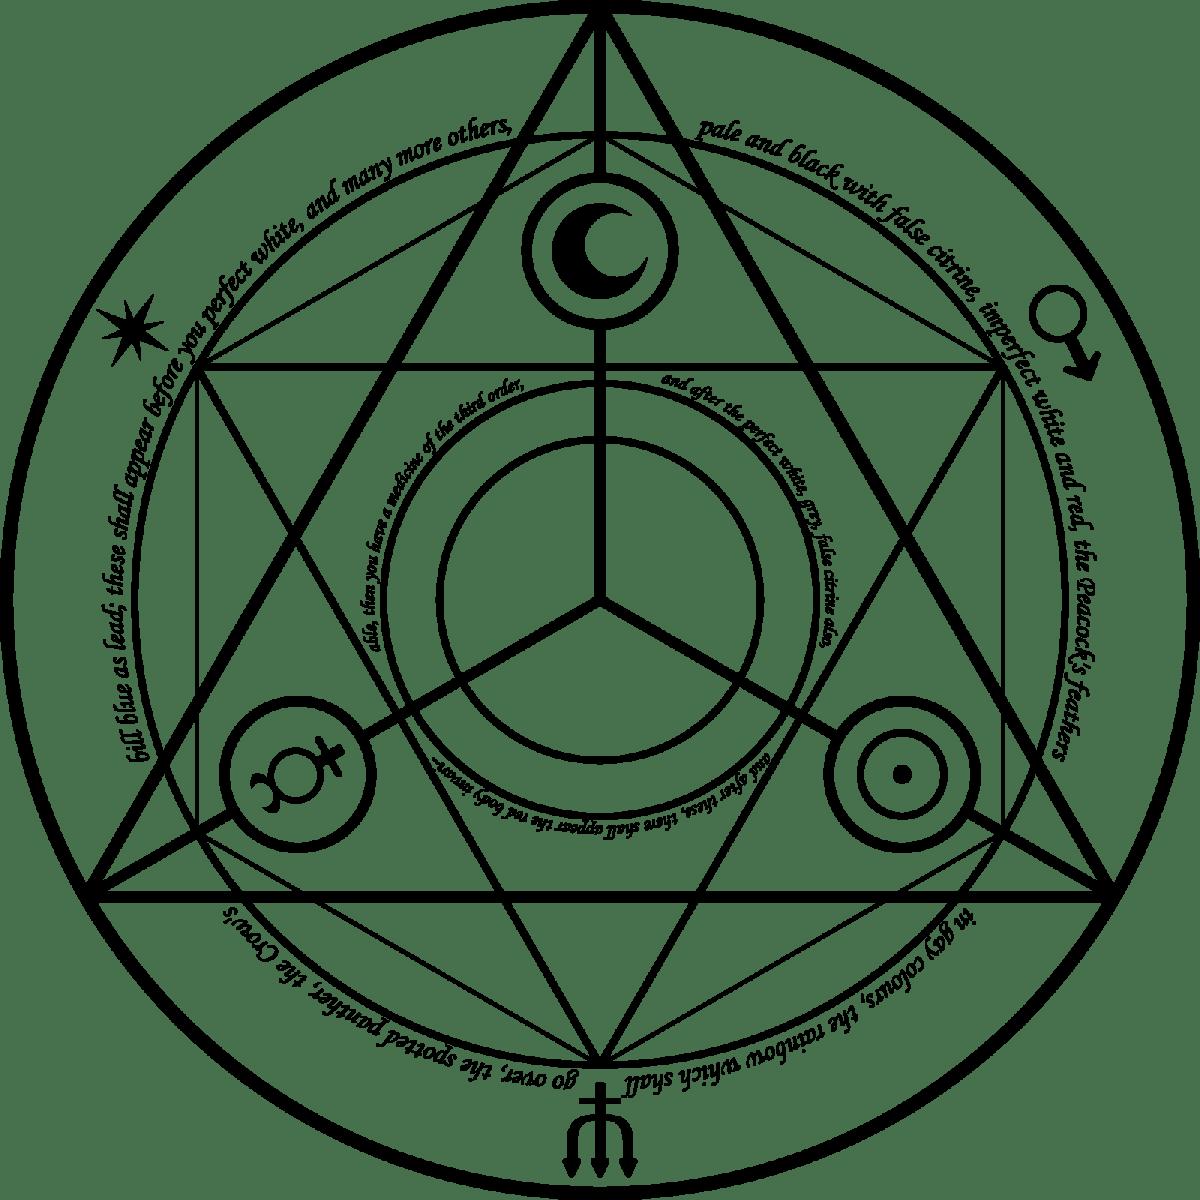 Horoscopul Alchimist